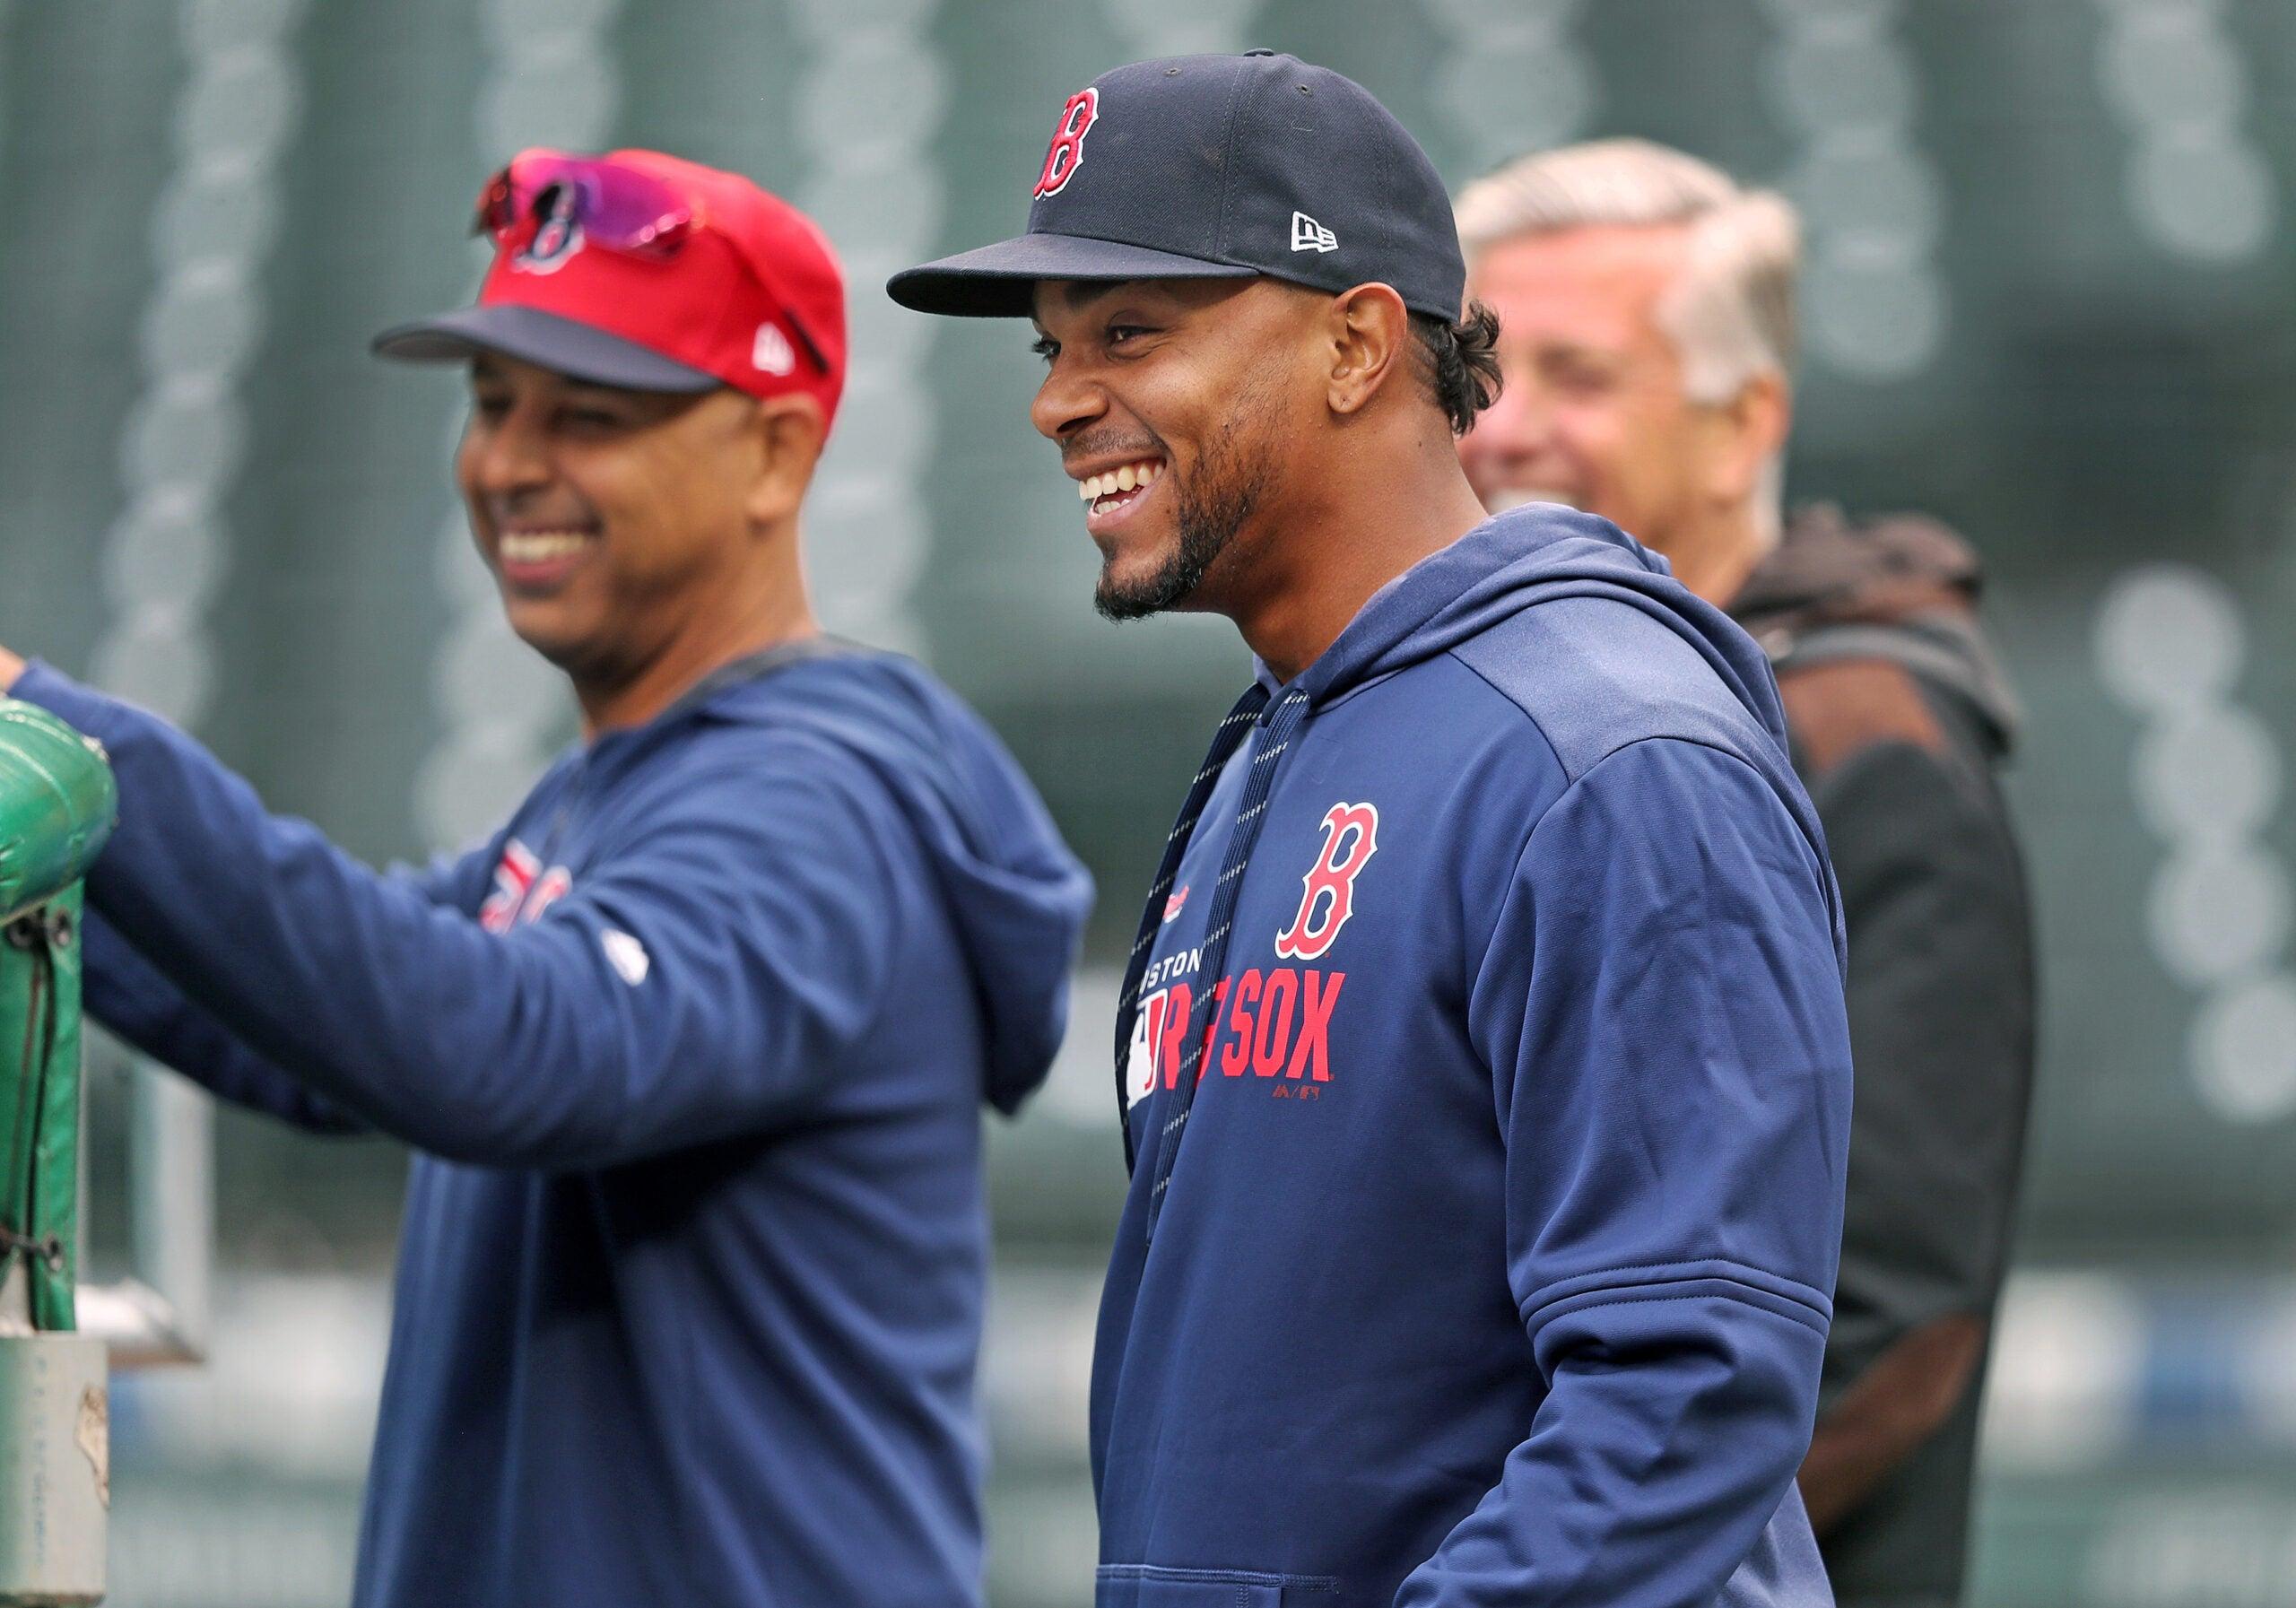 Xander Bogaerts Red Sox Shortstop